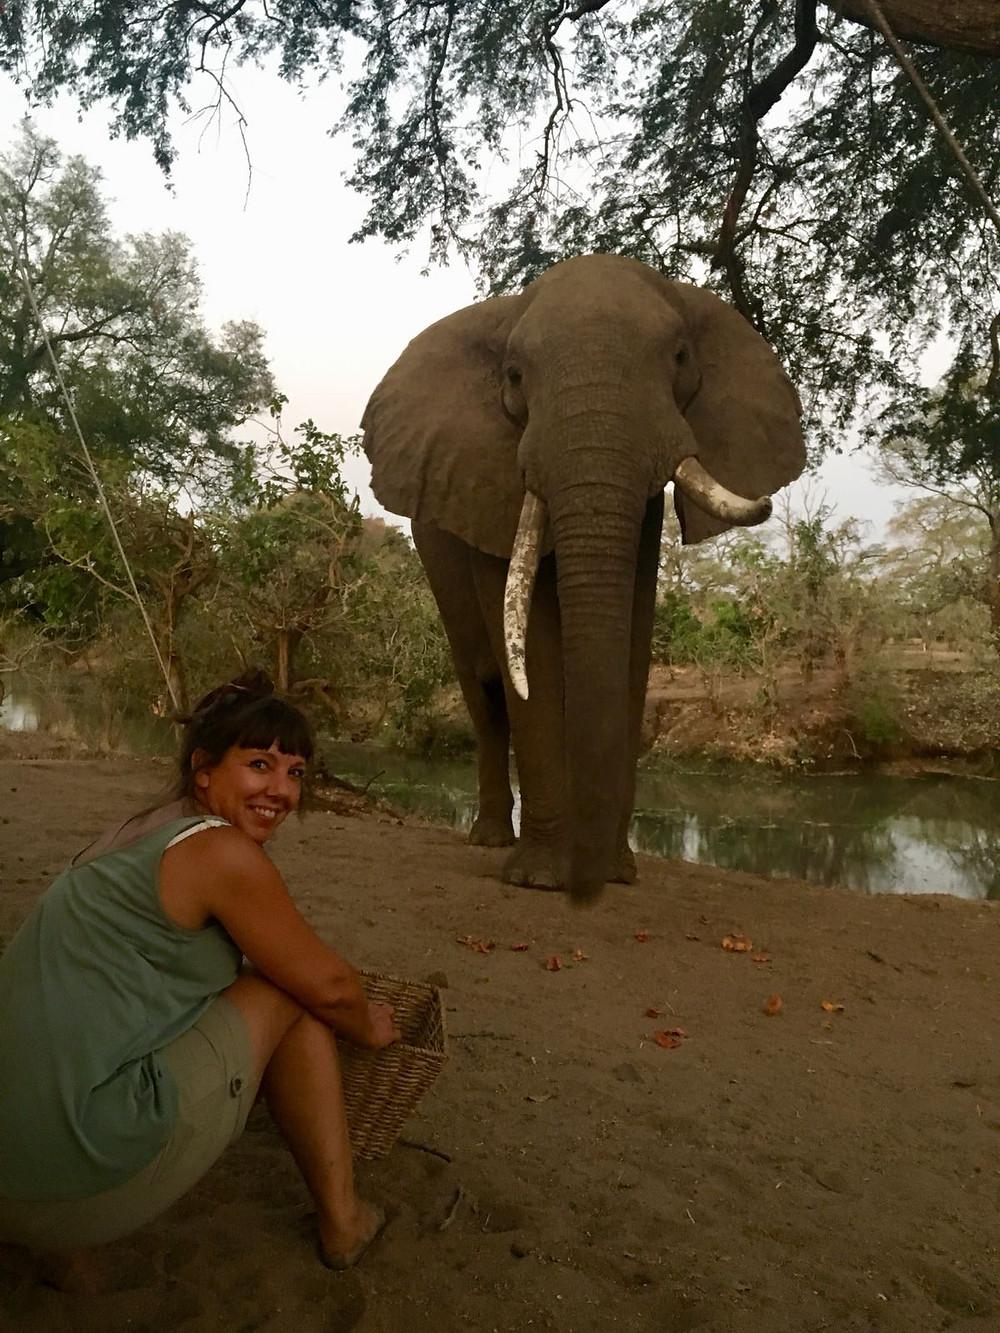 wild bull elephant close up